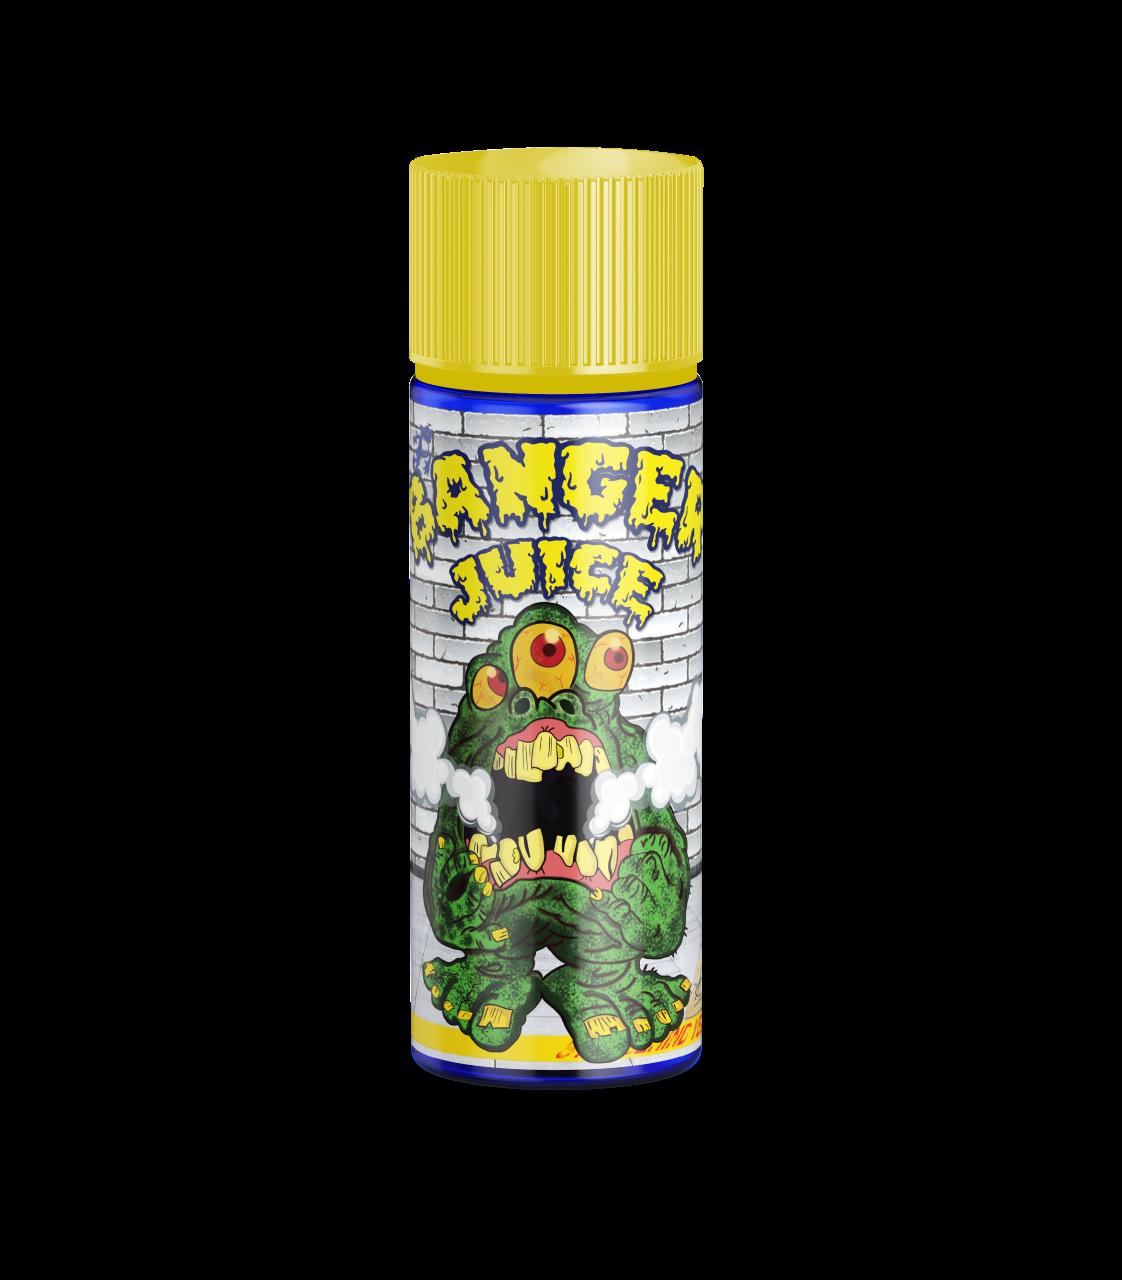 Banger Juice 100ml - Honeydew-vanilla-ice-cream